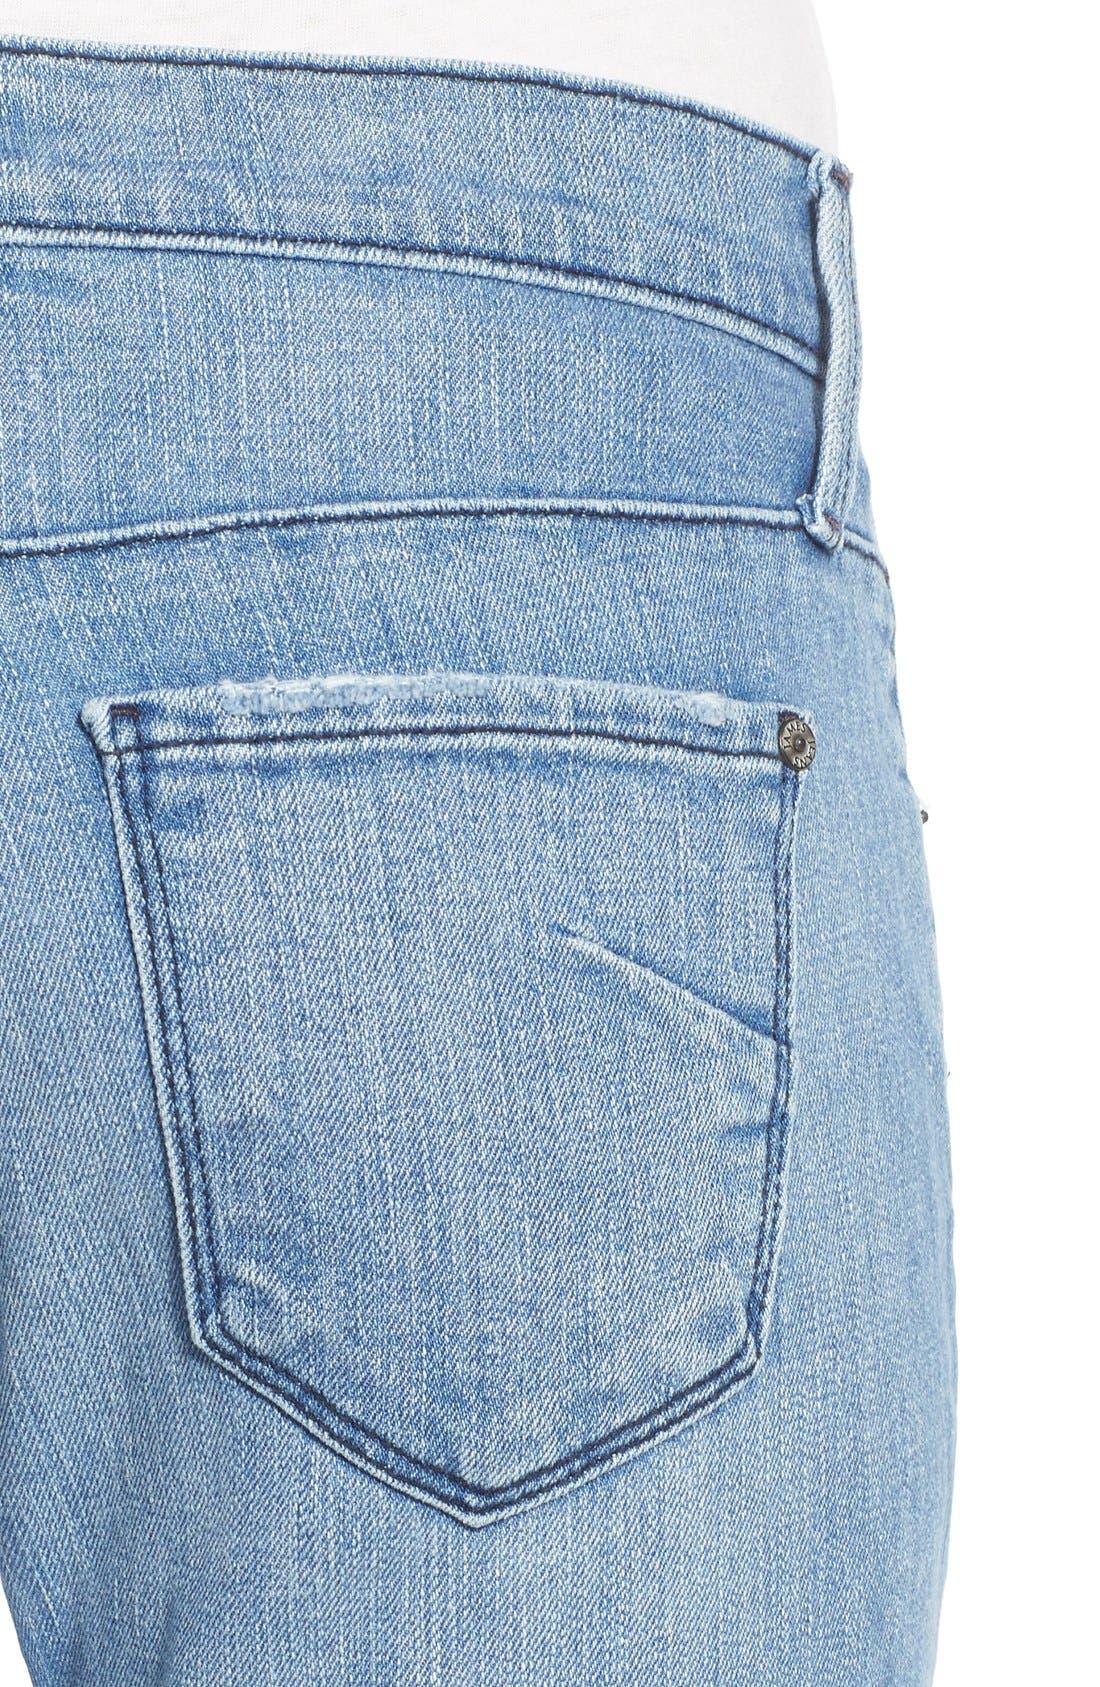 Alternate Image 4  - James Jeans Distressed Slim Boyfriend Jeans (Joy Ride)